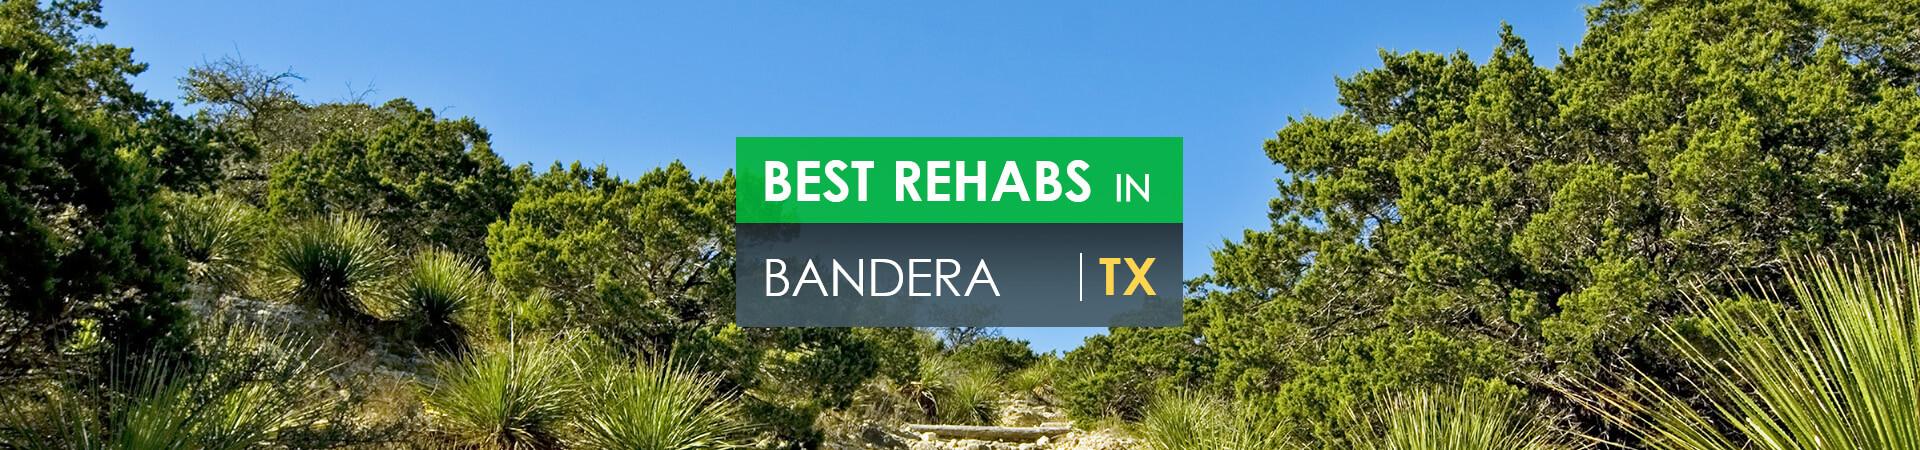 Best rehabs in Bandera, TX